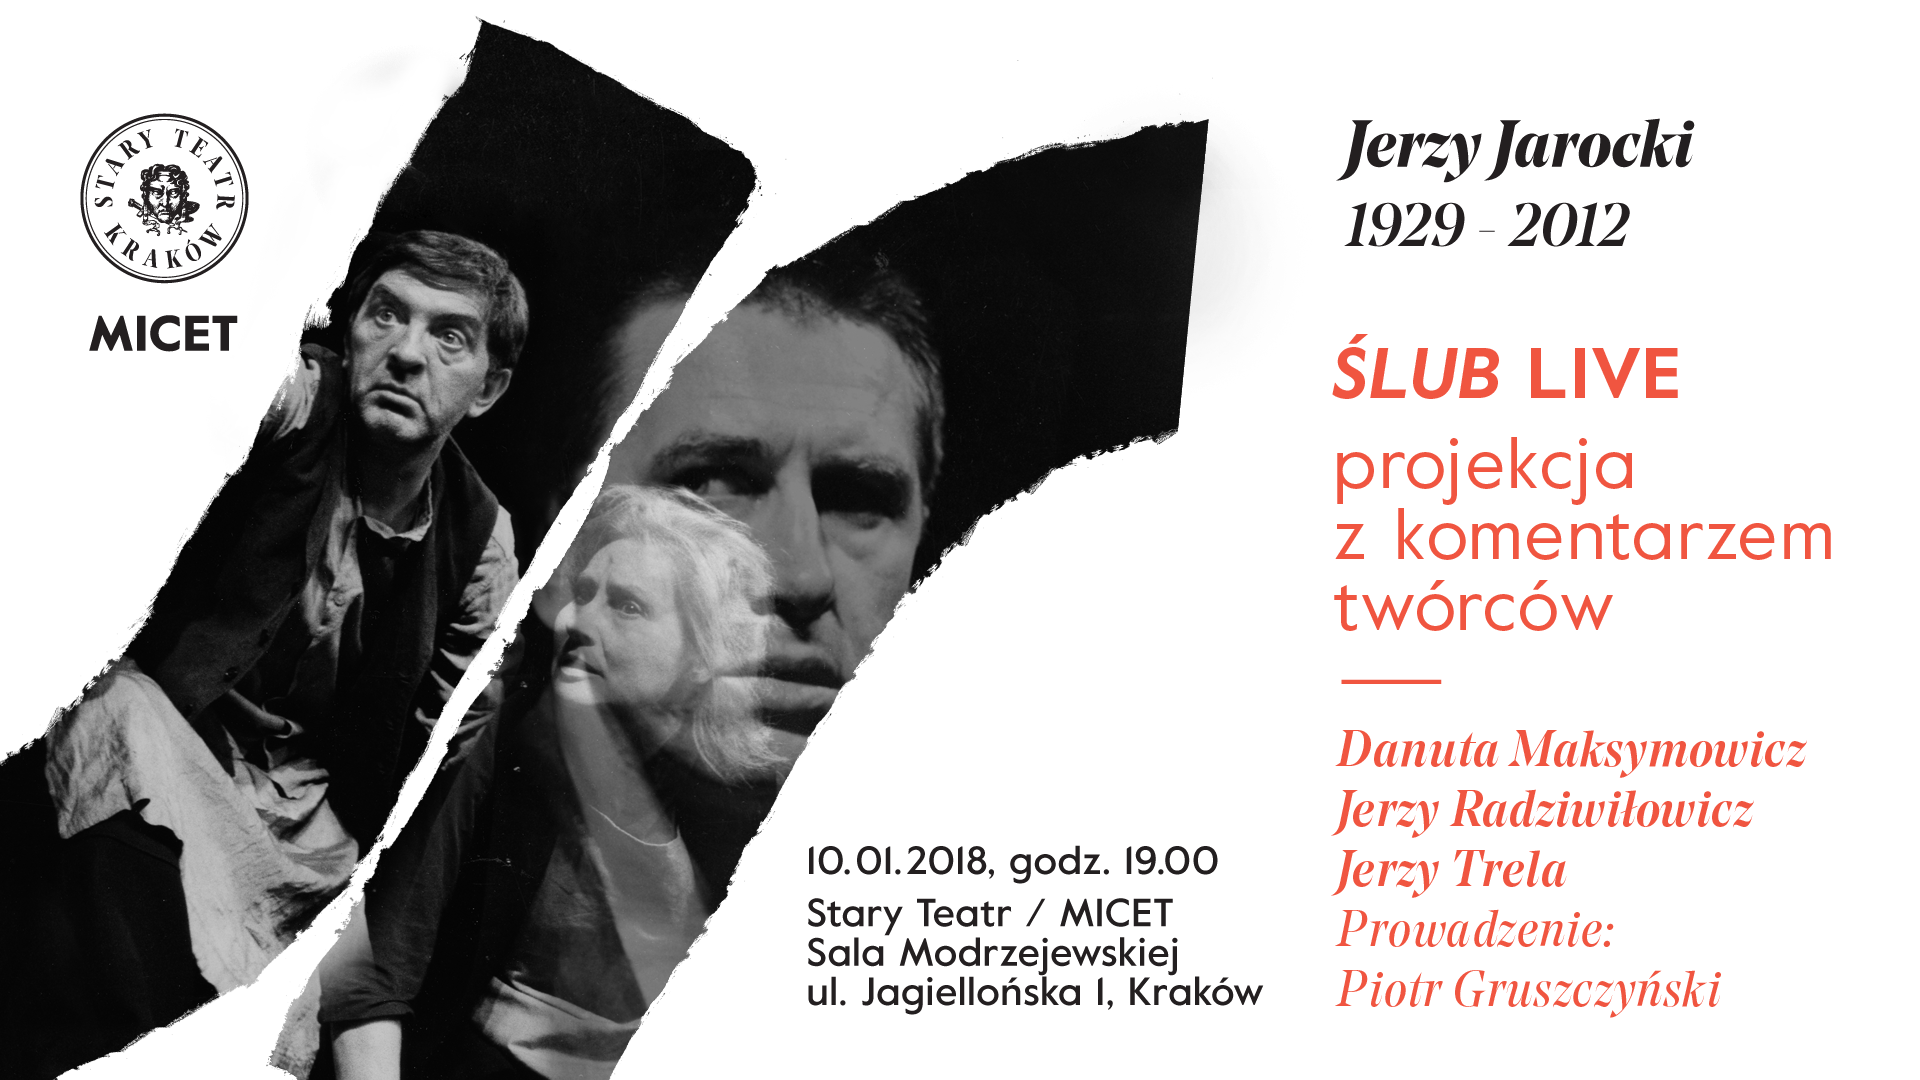 JAROCKI ŚLUB LIVE